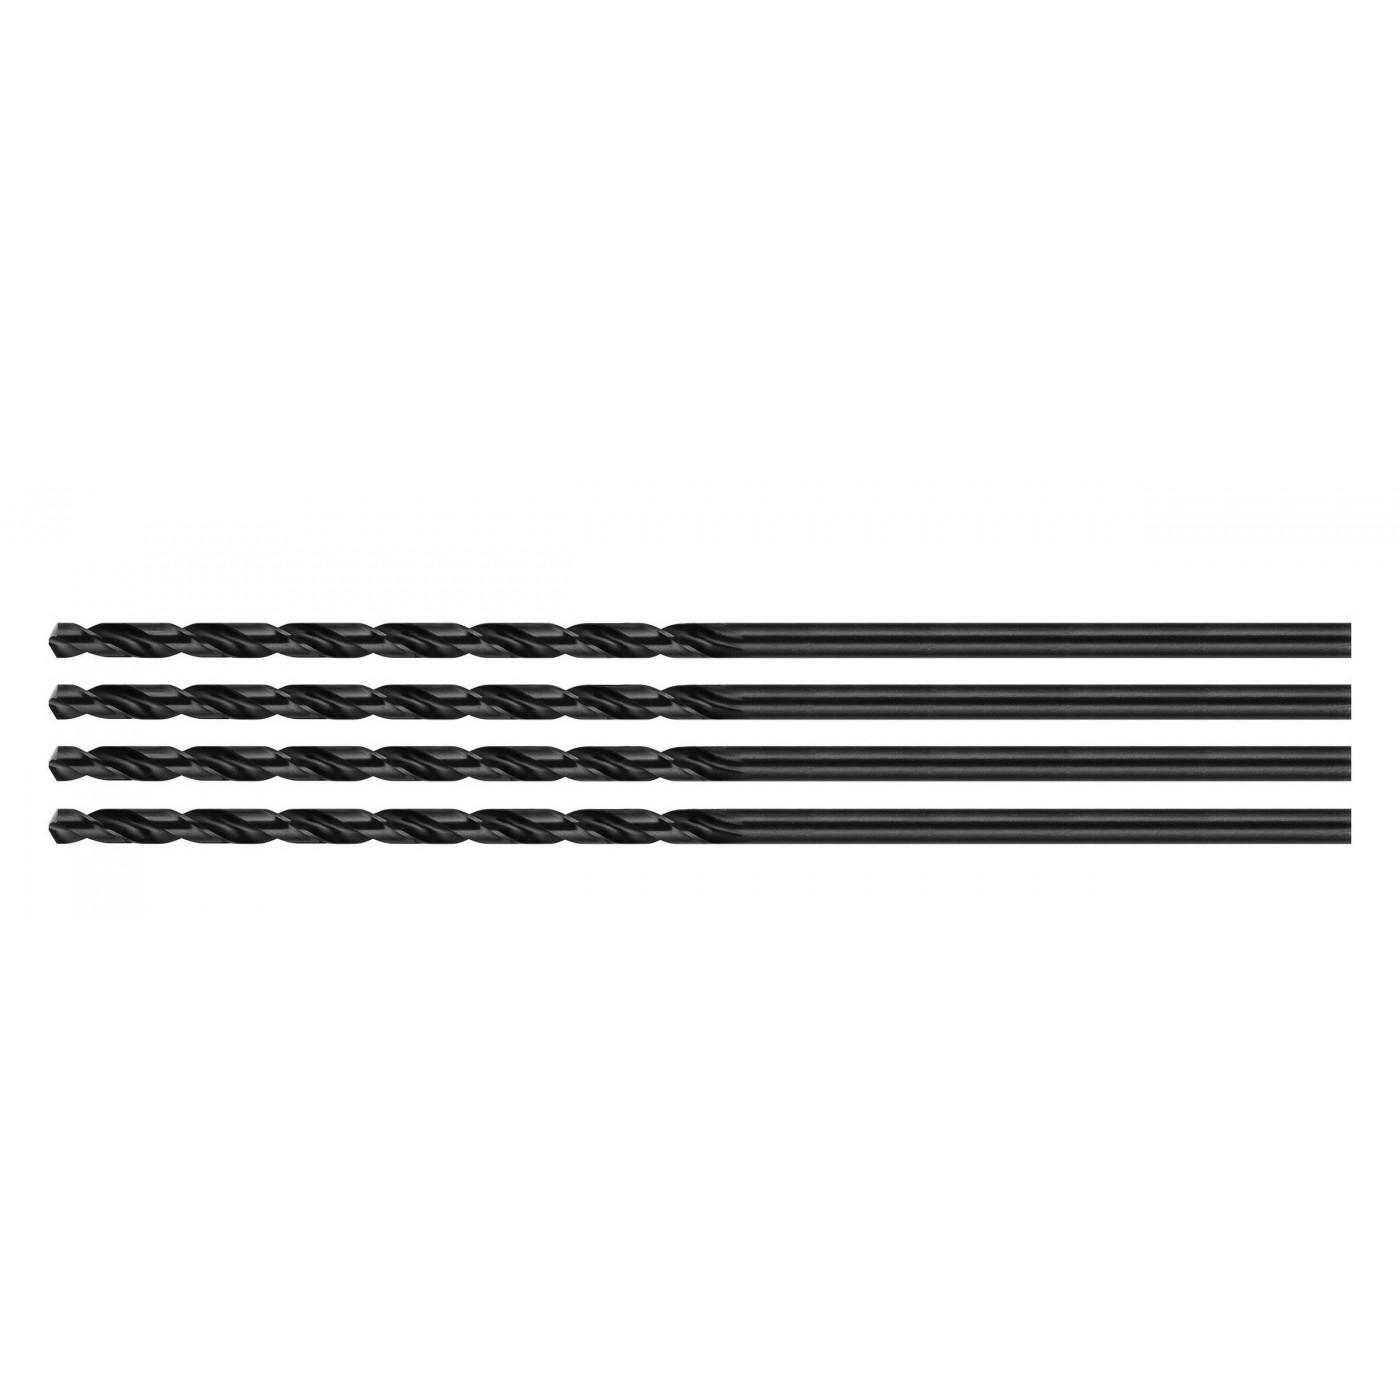 Set of 4 metal drill bits, extra long (5.2x350 mm)